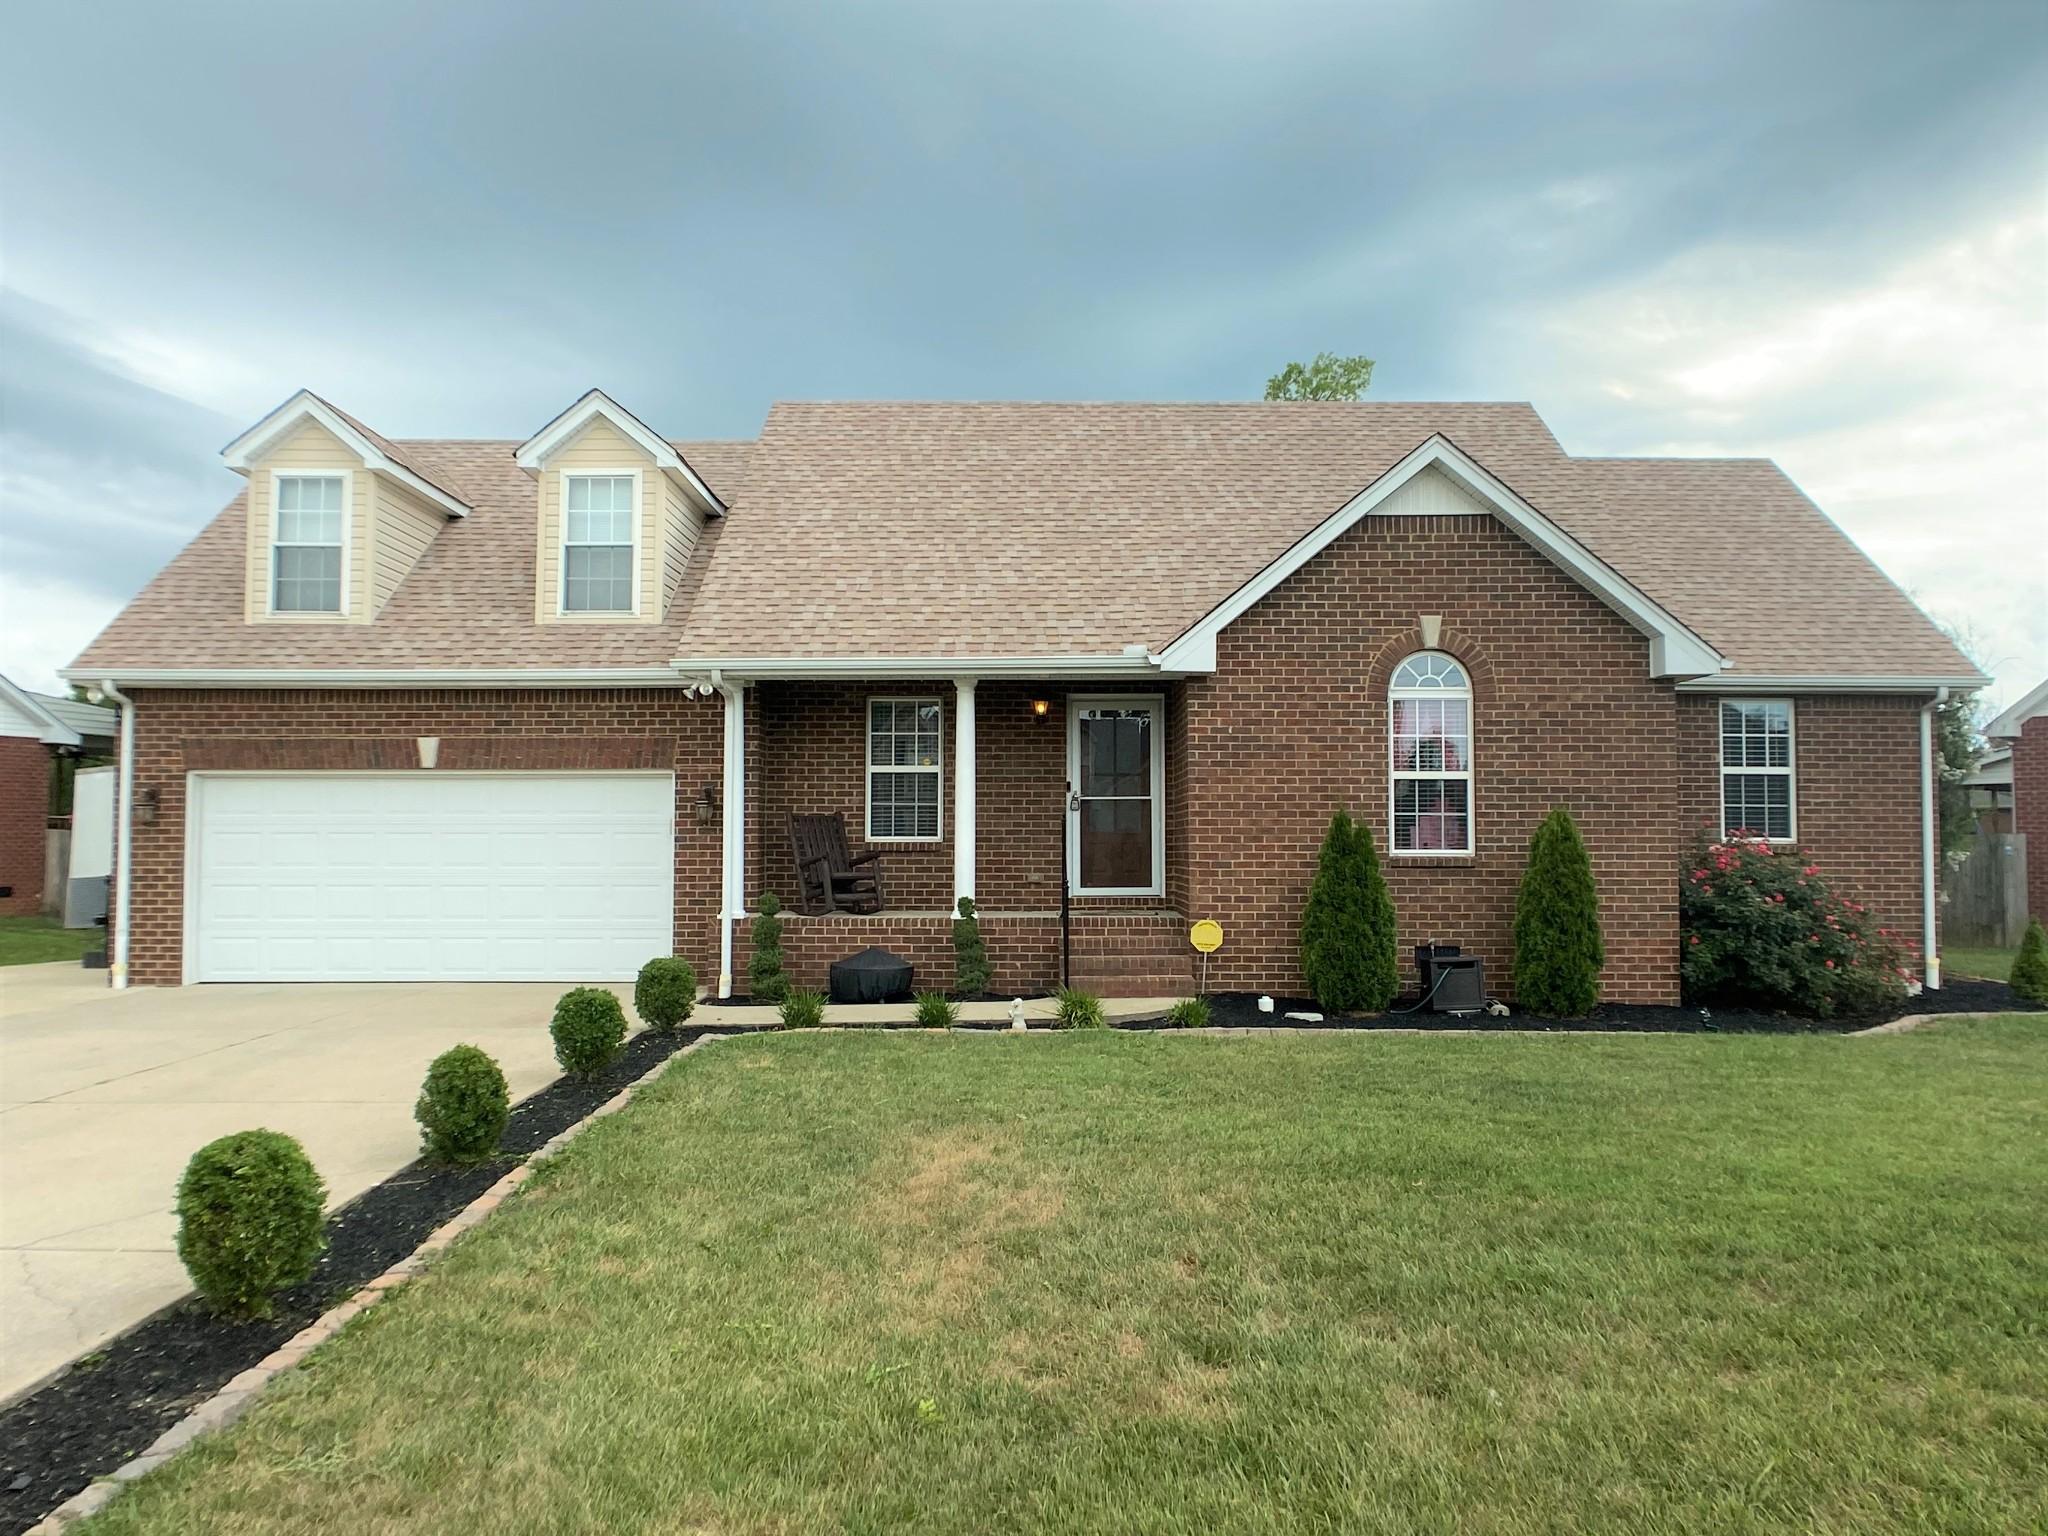 1738 Cozumel Ct Property Photo - Murfreesboro, TN real estate listing